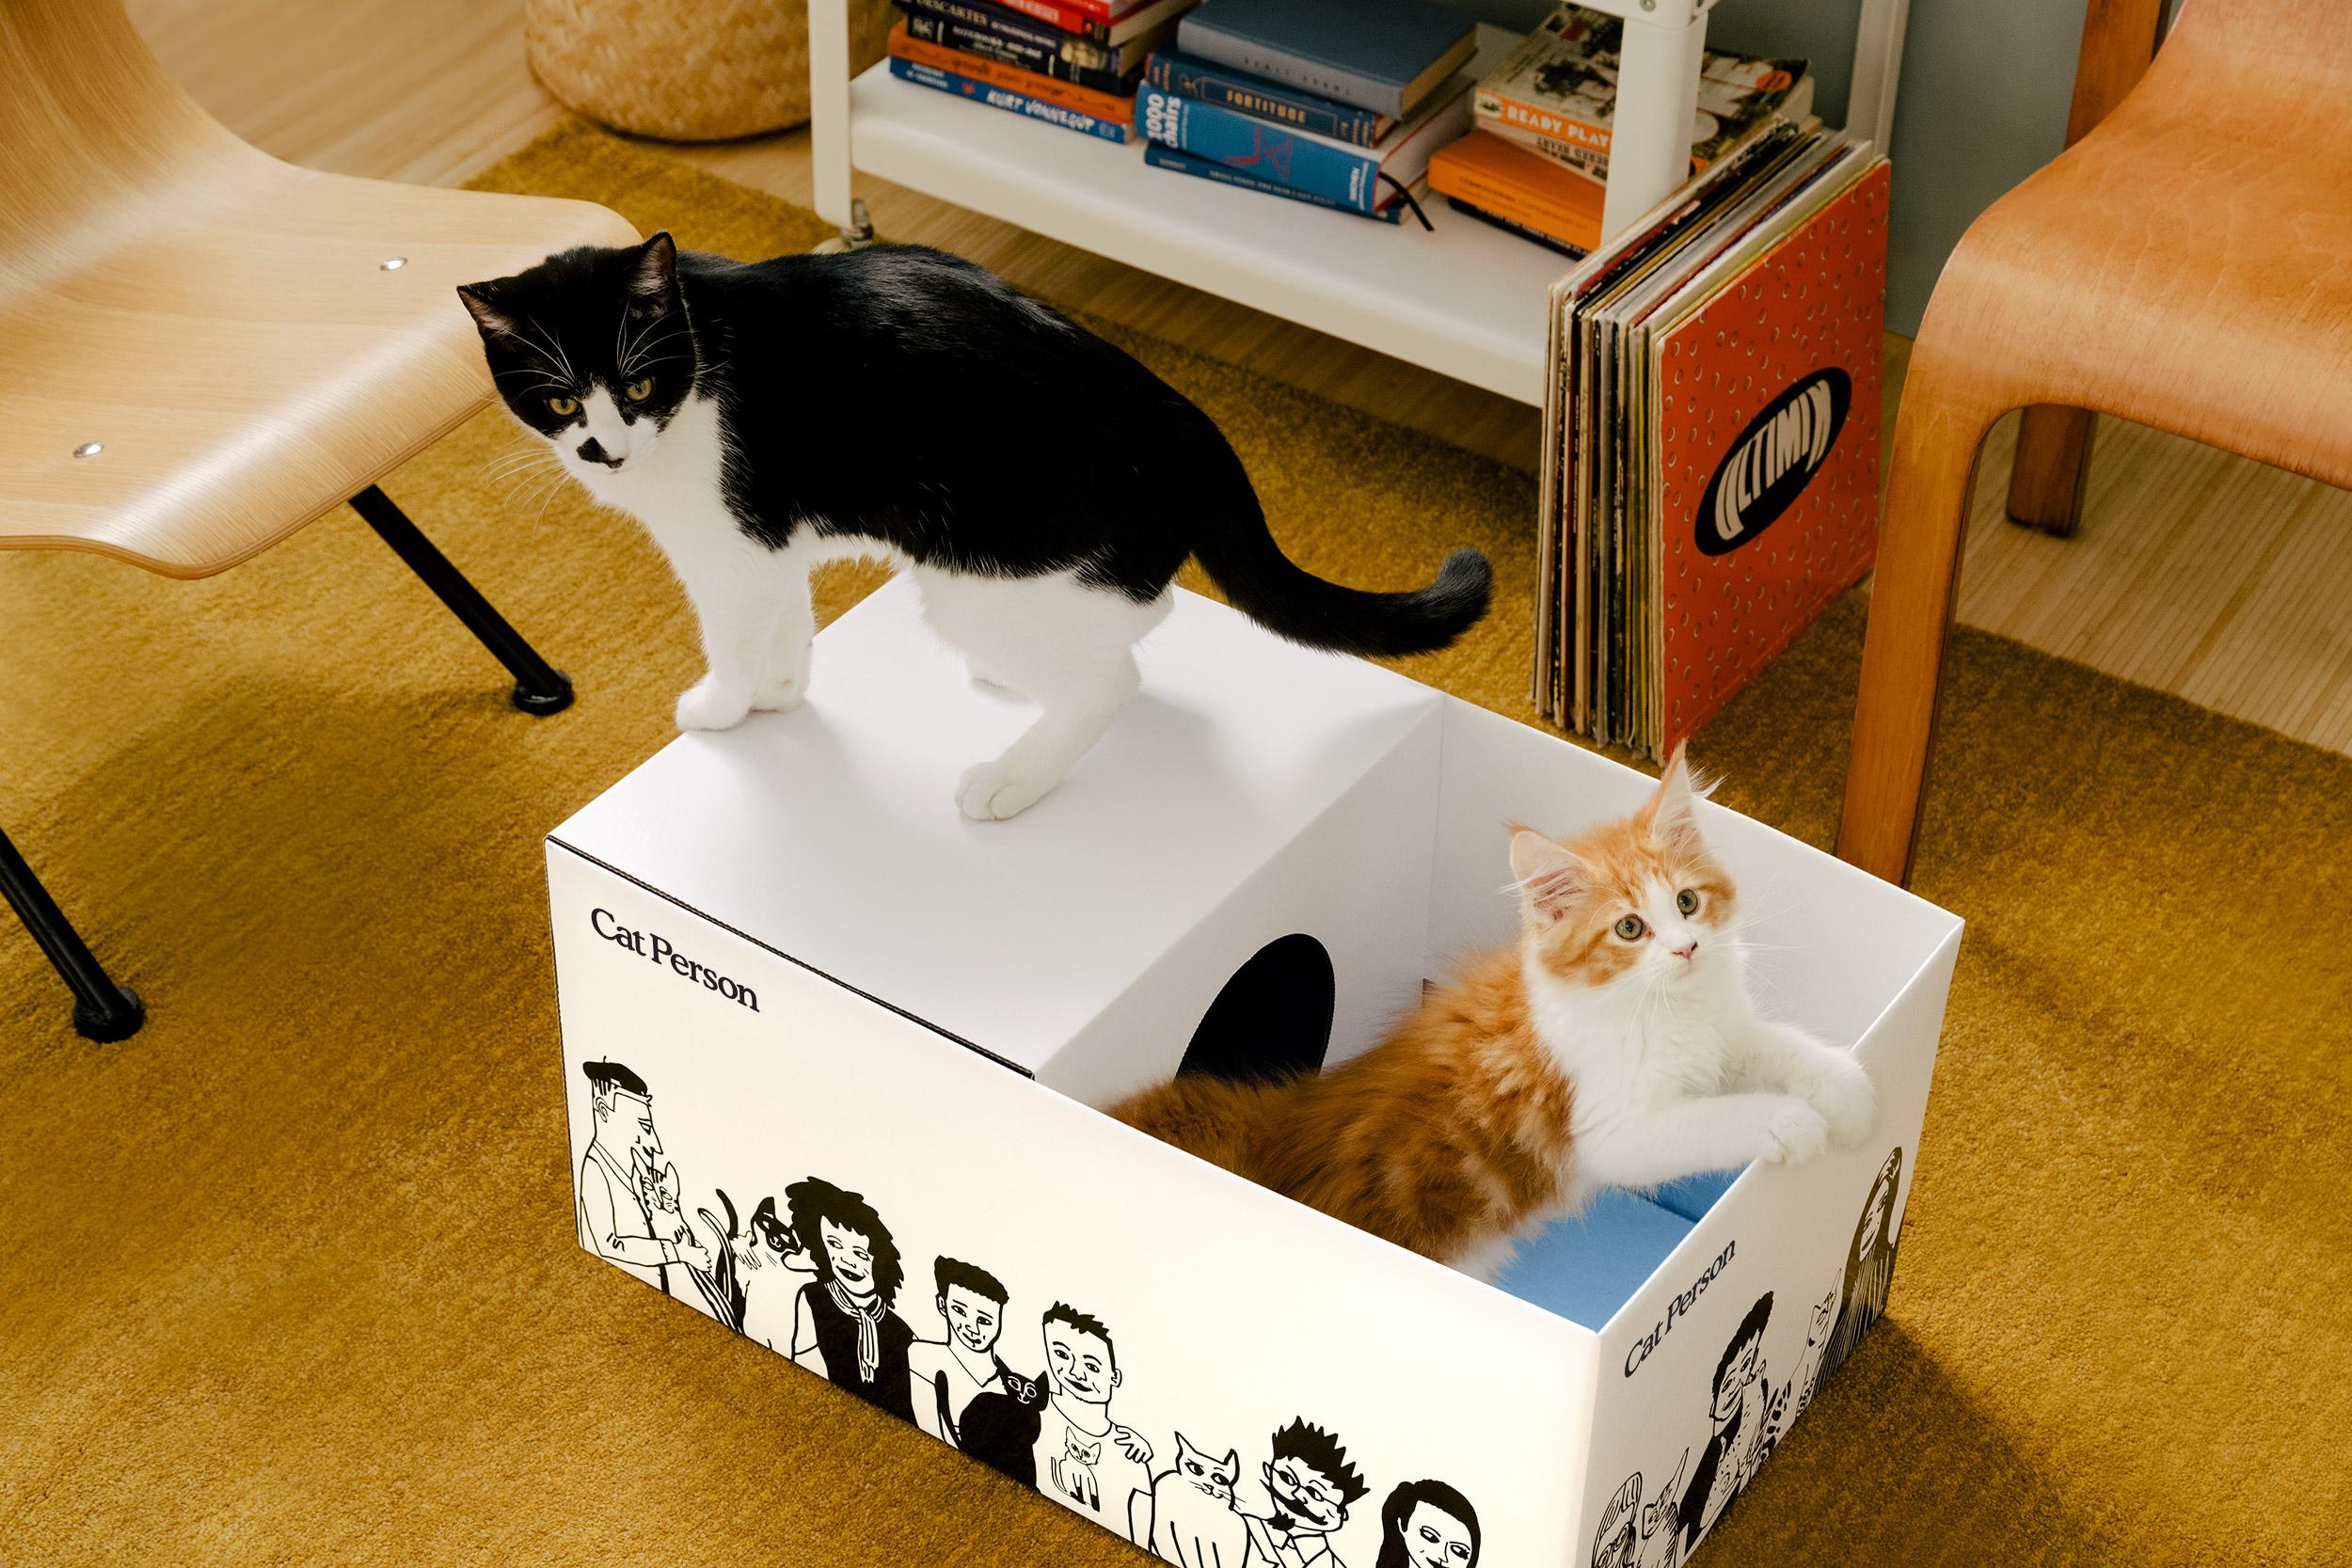 19_11_05-Cat-Person_CAT-BOX_198